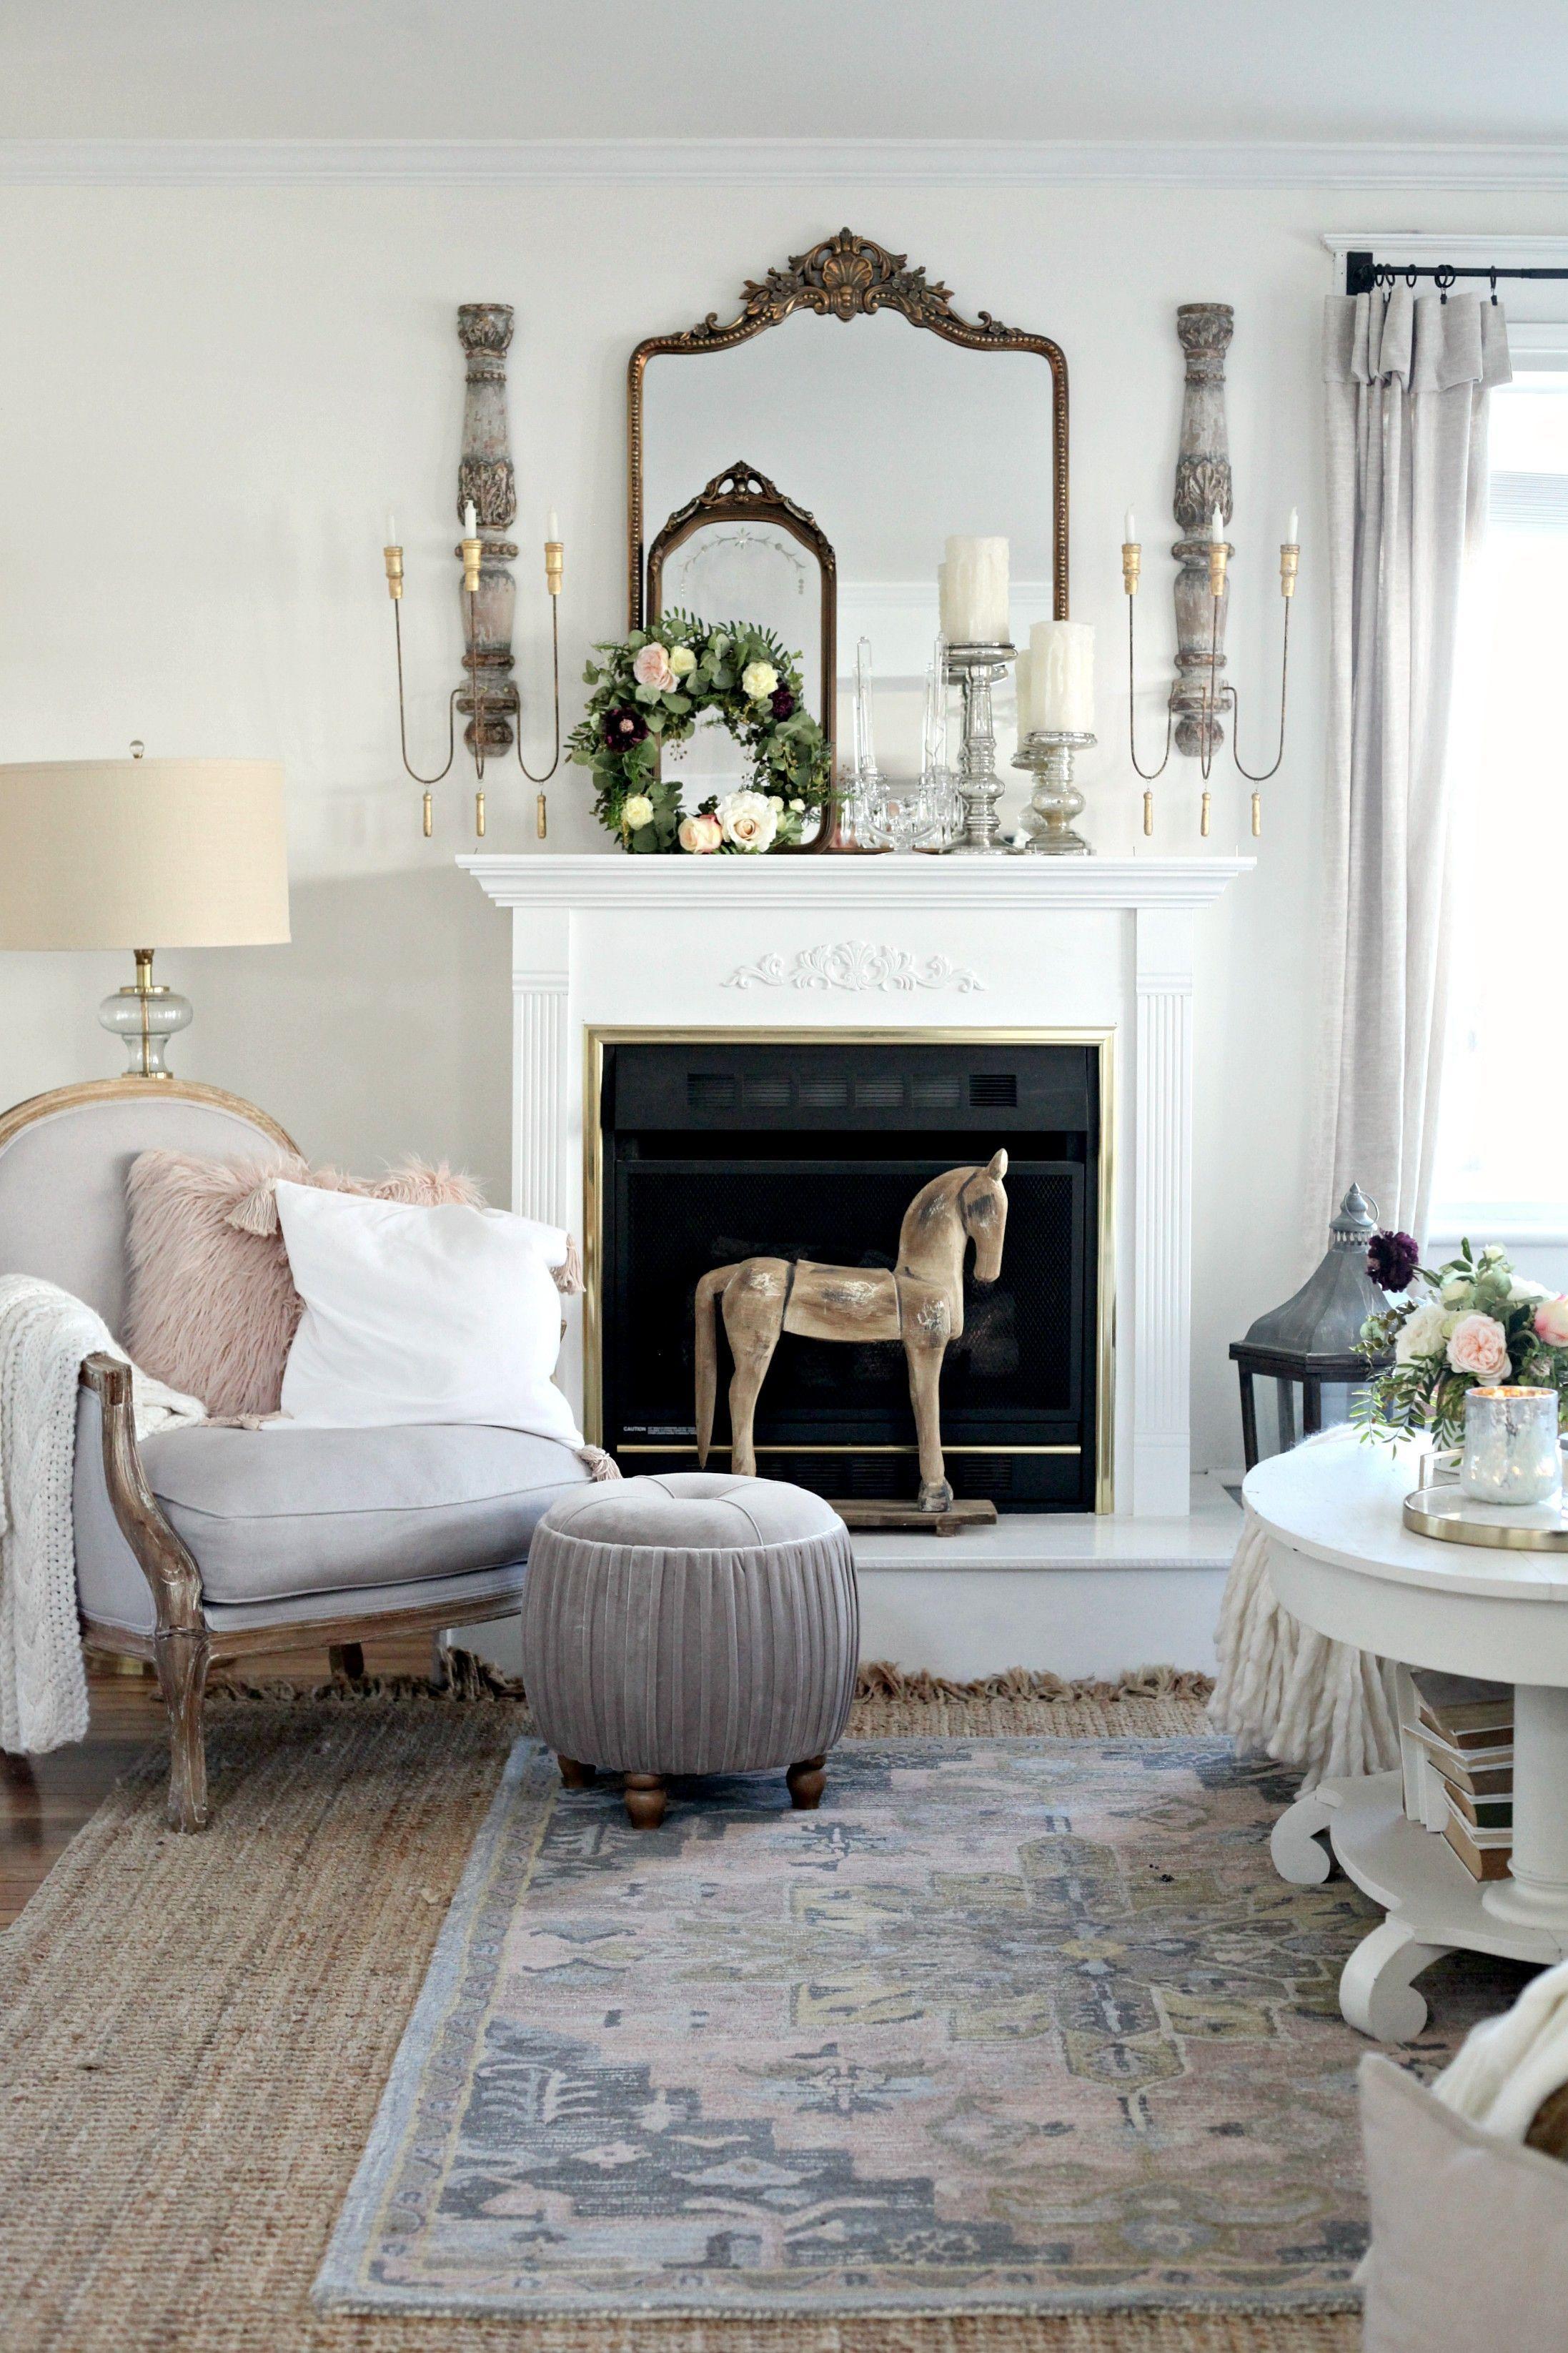 springdecor livingroom whitelivingroom frenchcountry frenchchic